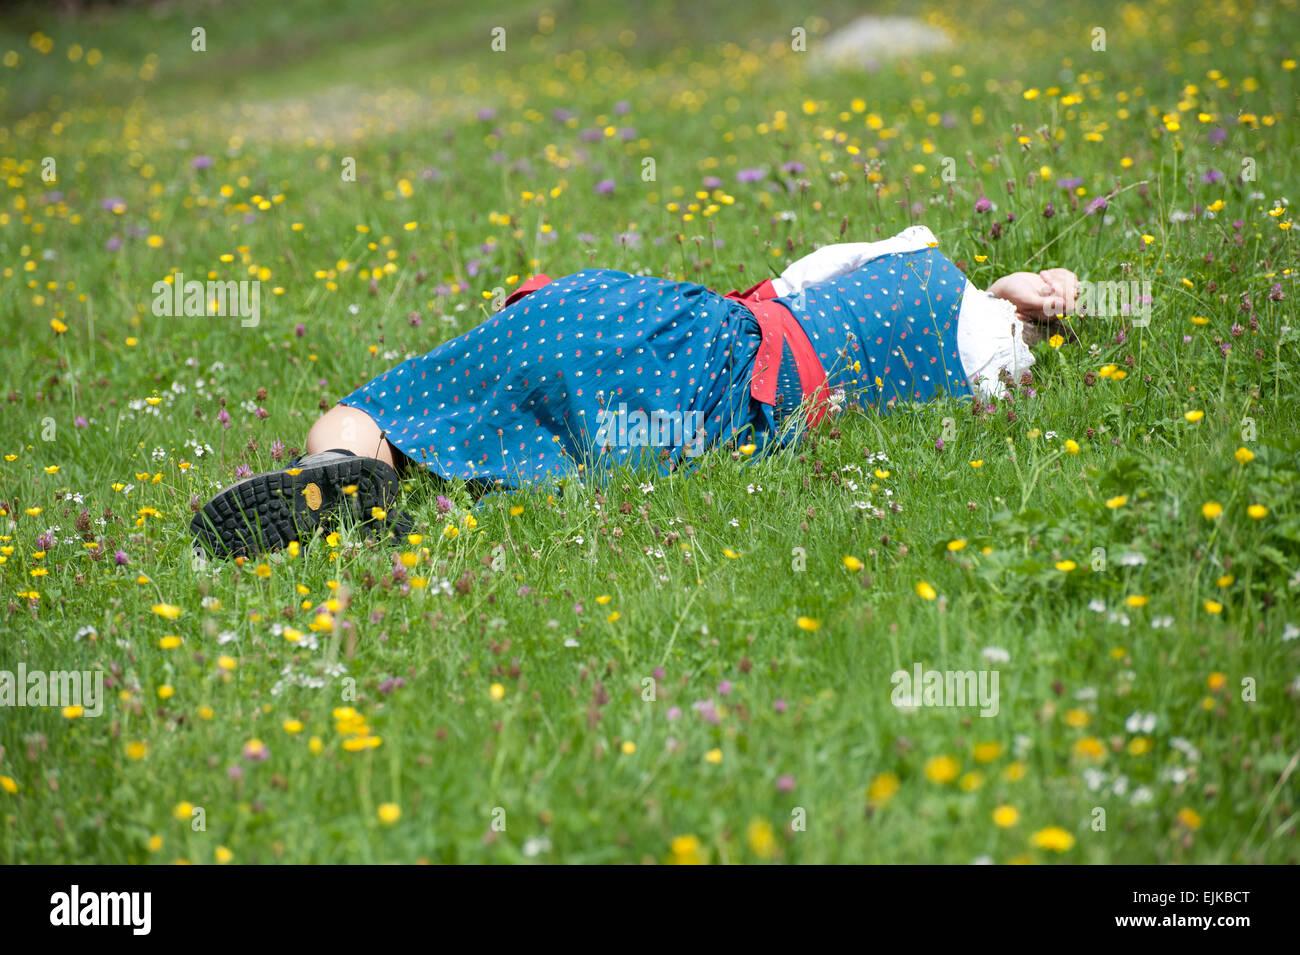 Schlafende Frau am Pfeifertag, Blaa Alm, Altausseee, Salzkammergut, Styria, Austria - Stock Image